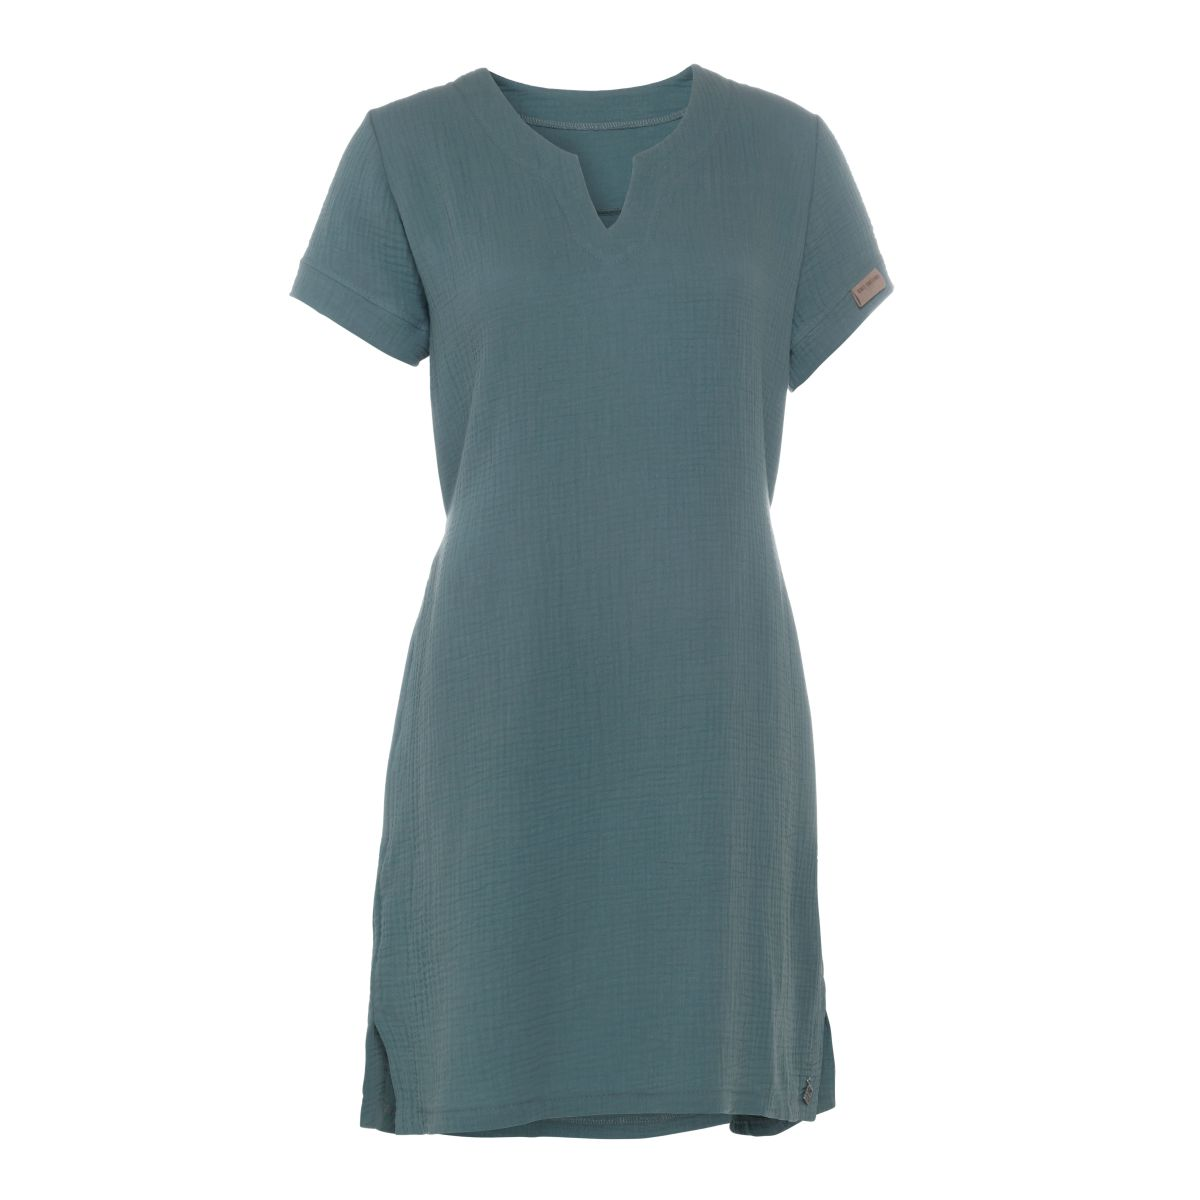 knit factory kf15012000951 indy jurk stone green l 1